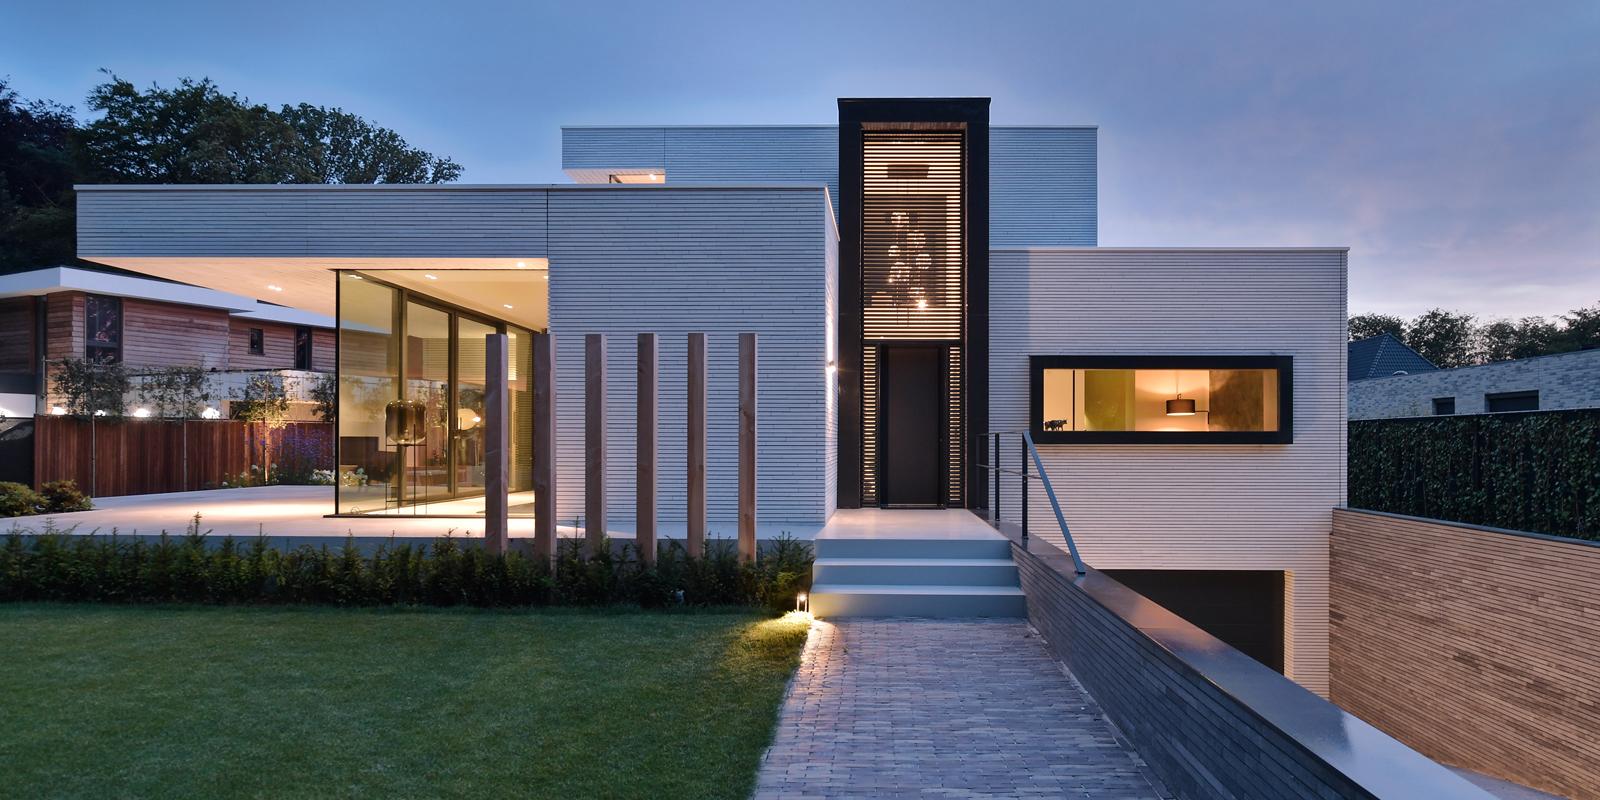 Ibiza stijl, Frans van Roy, Ibiza interieur, Villa met zwembad, Witte villa, Minimalistisch interieur, Interieur design,